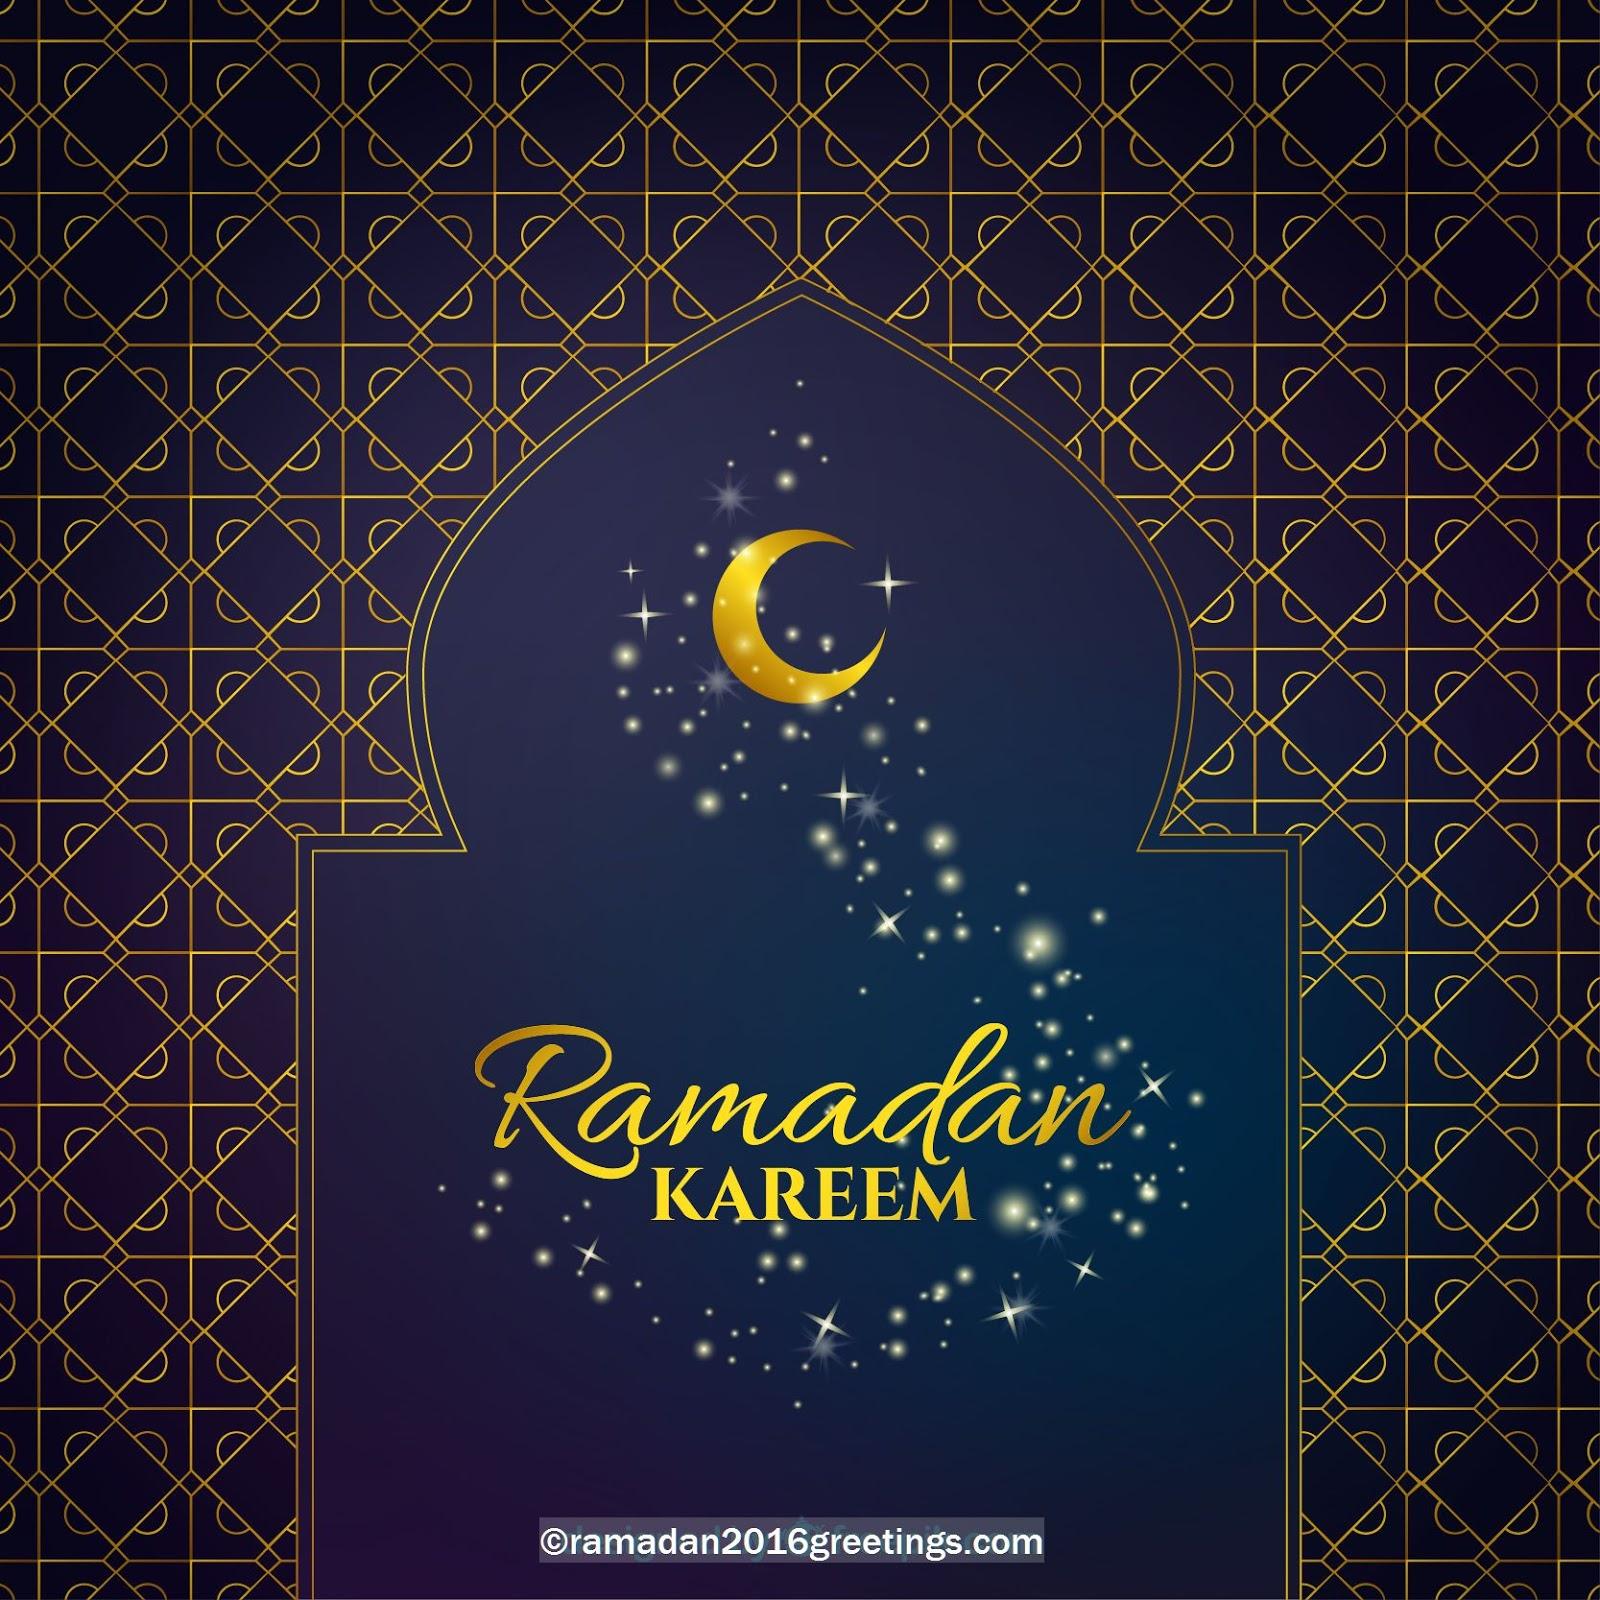 Ramadan 2016 ramadan greetings eid al fitr 2016 quotes ramadan also read ramadan 2016 high quality images for desktop kristyandbryce Images